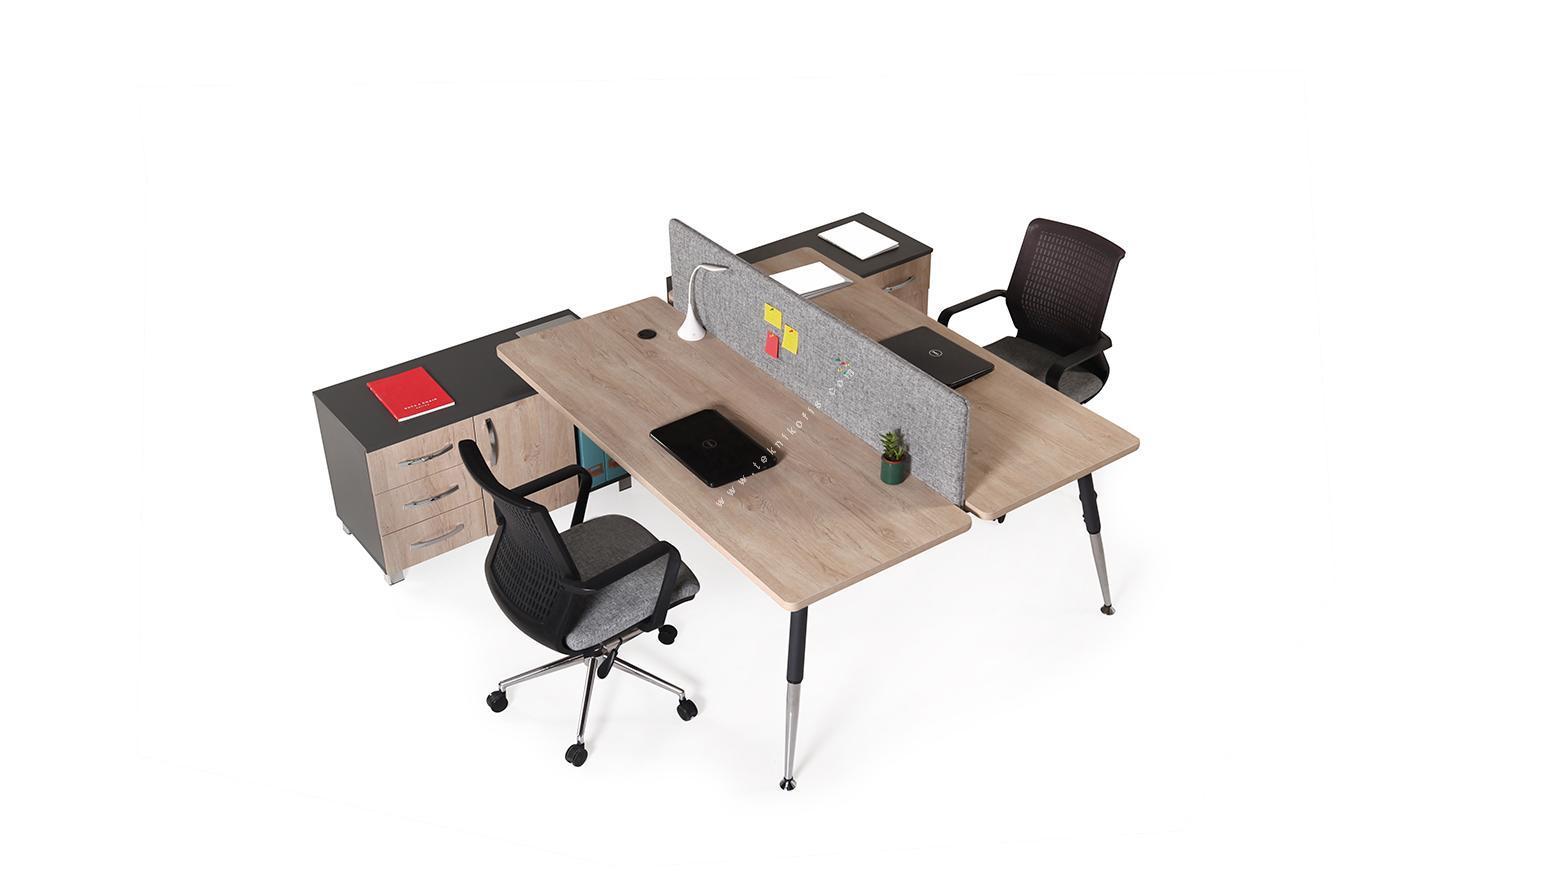 toucher 180cm ikili masa 18mm kumaş kaplamalı separatör